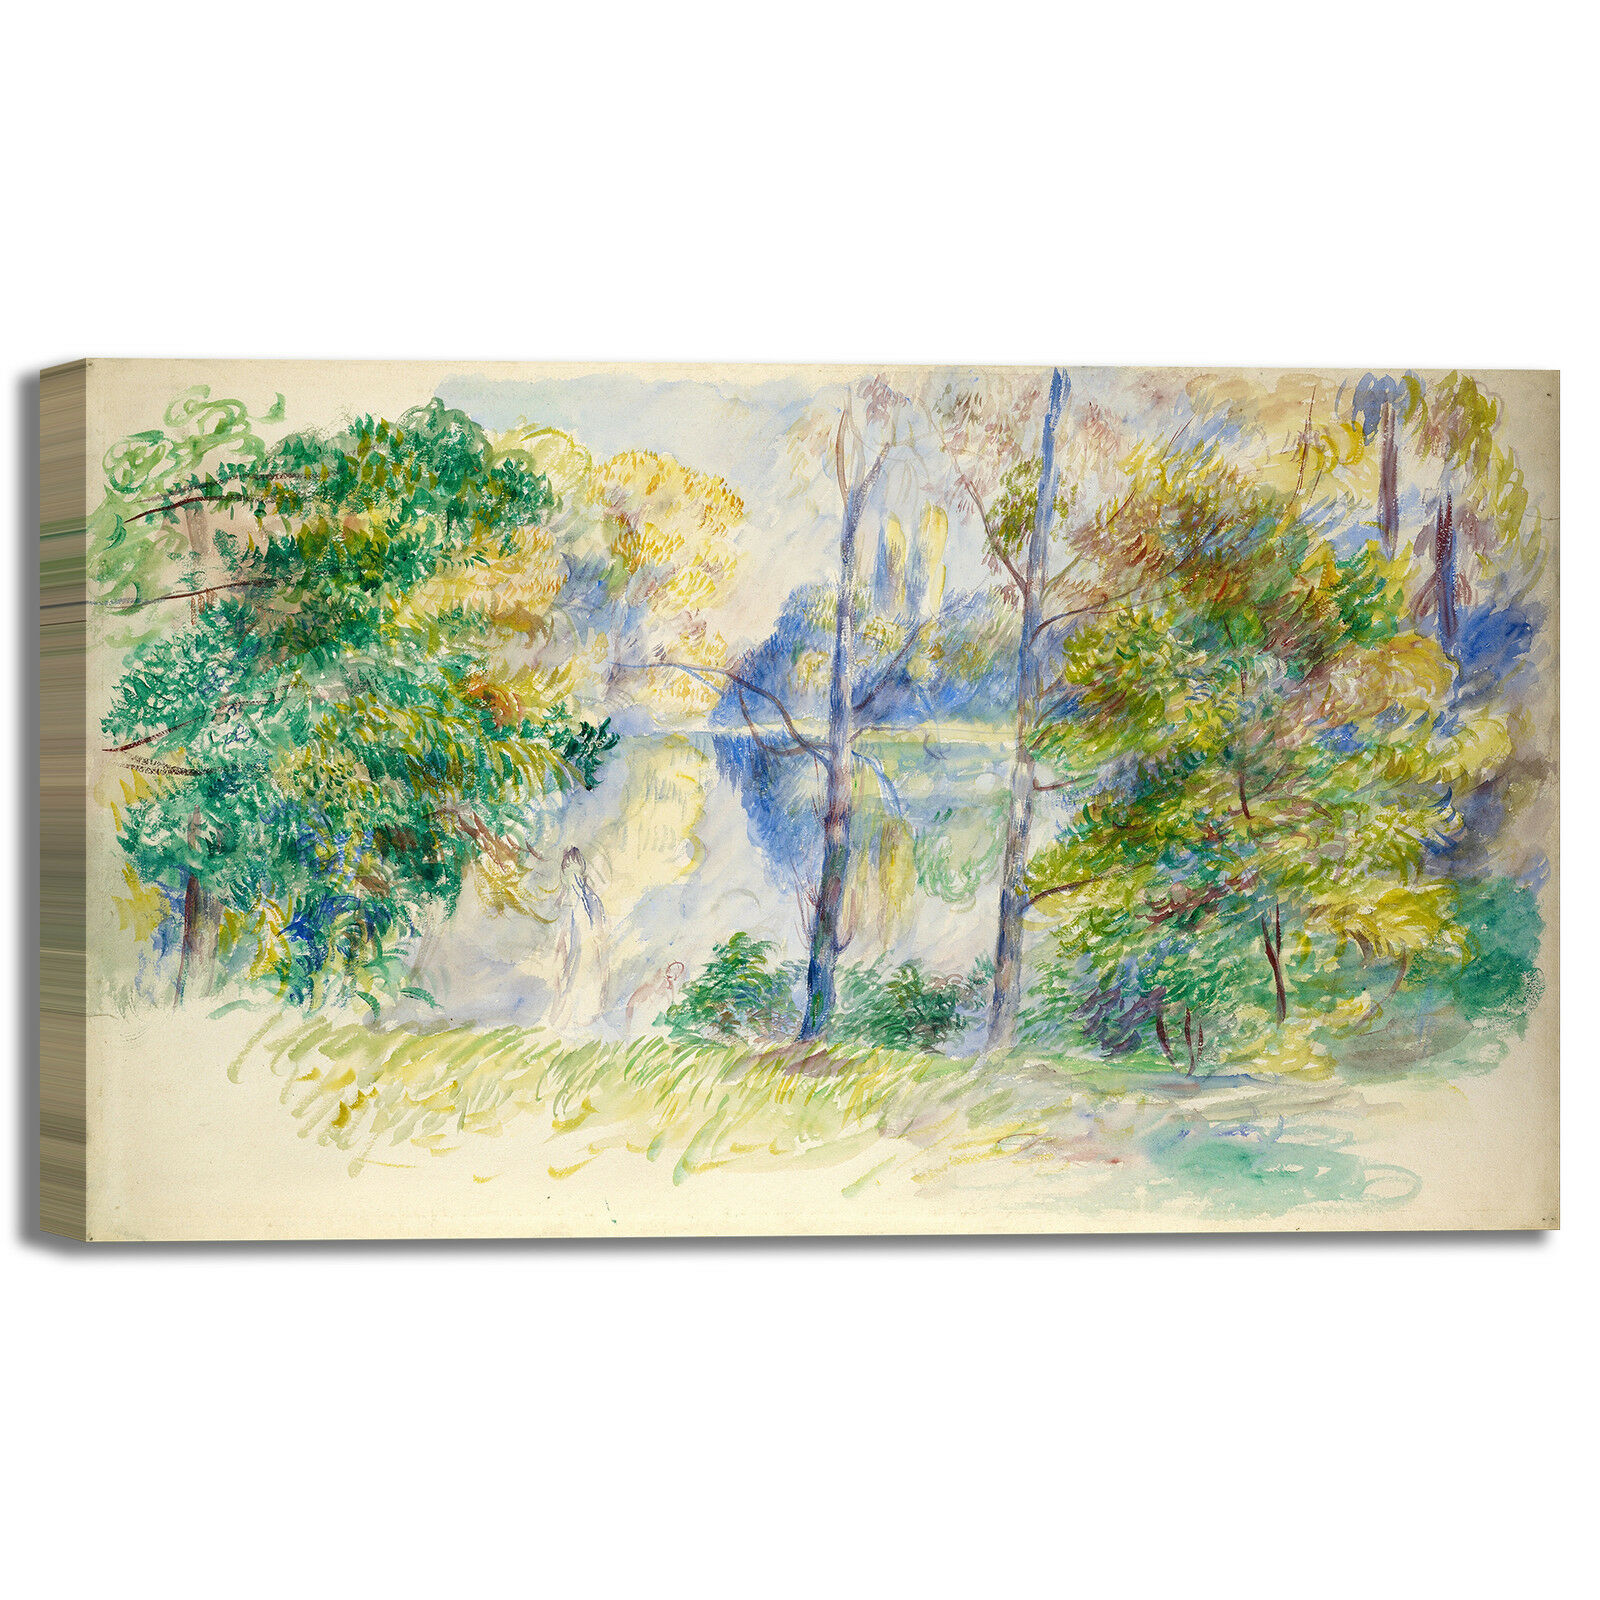 Reschwarz veduta di un parco design quadro quadro quadro stampa tela dipinto telaio arroto casa dc61c9